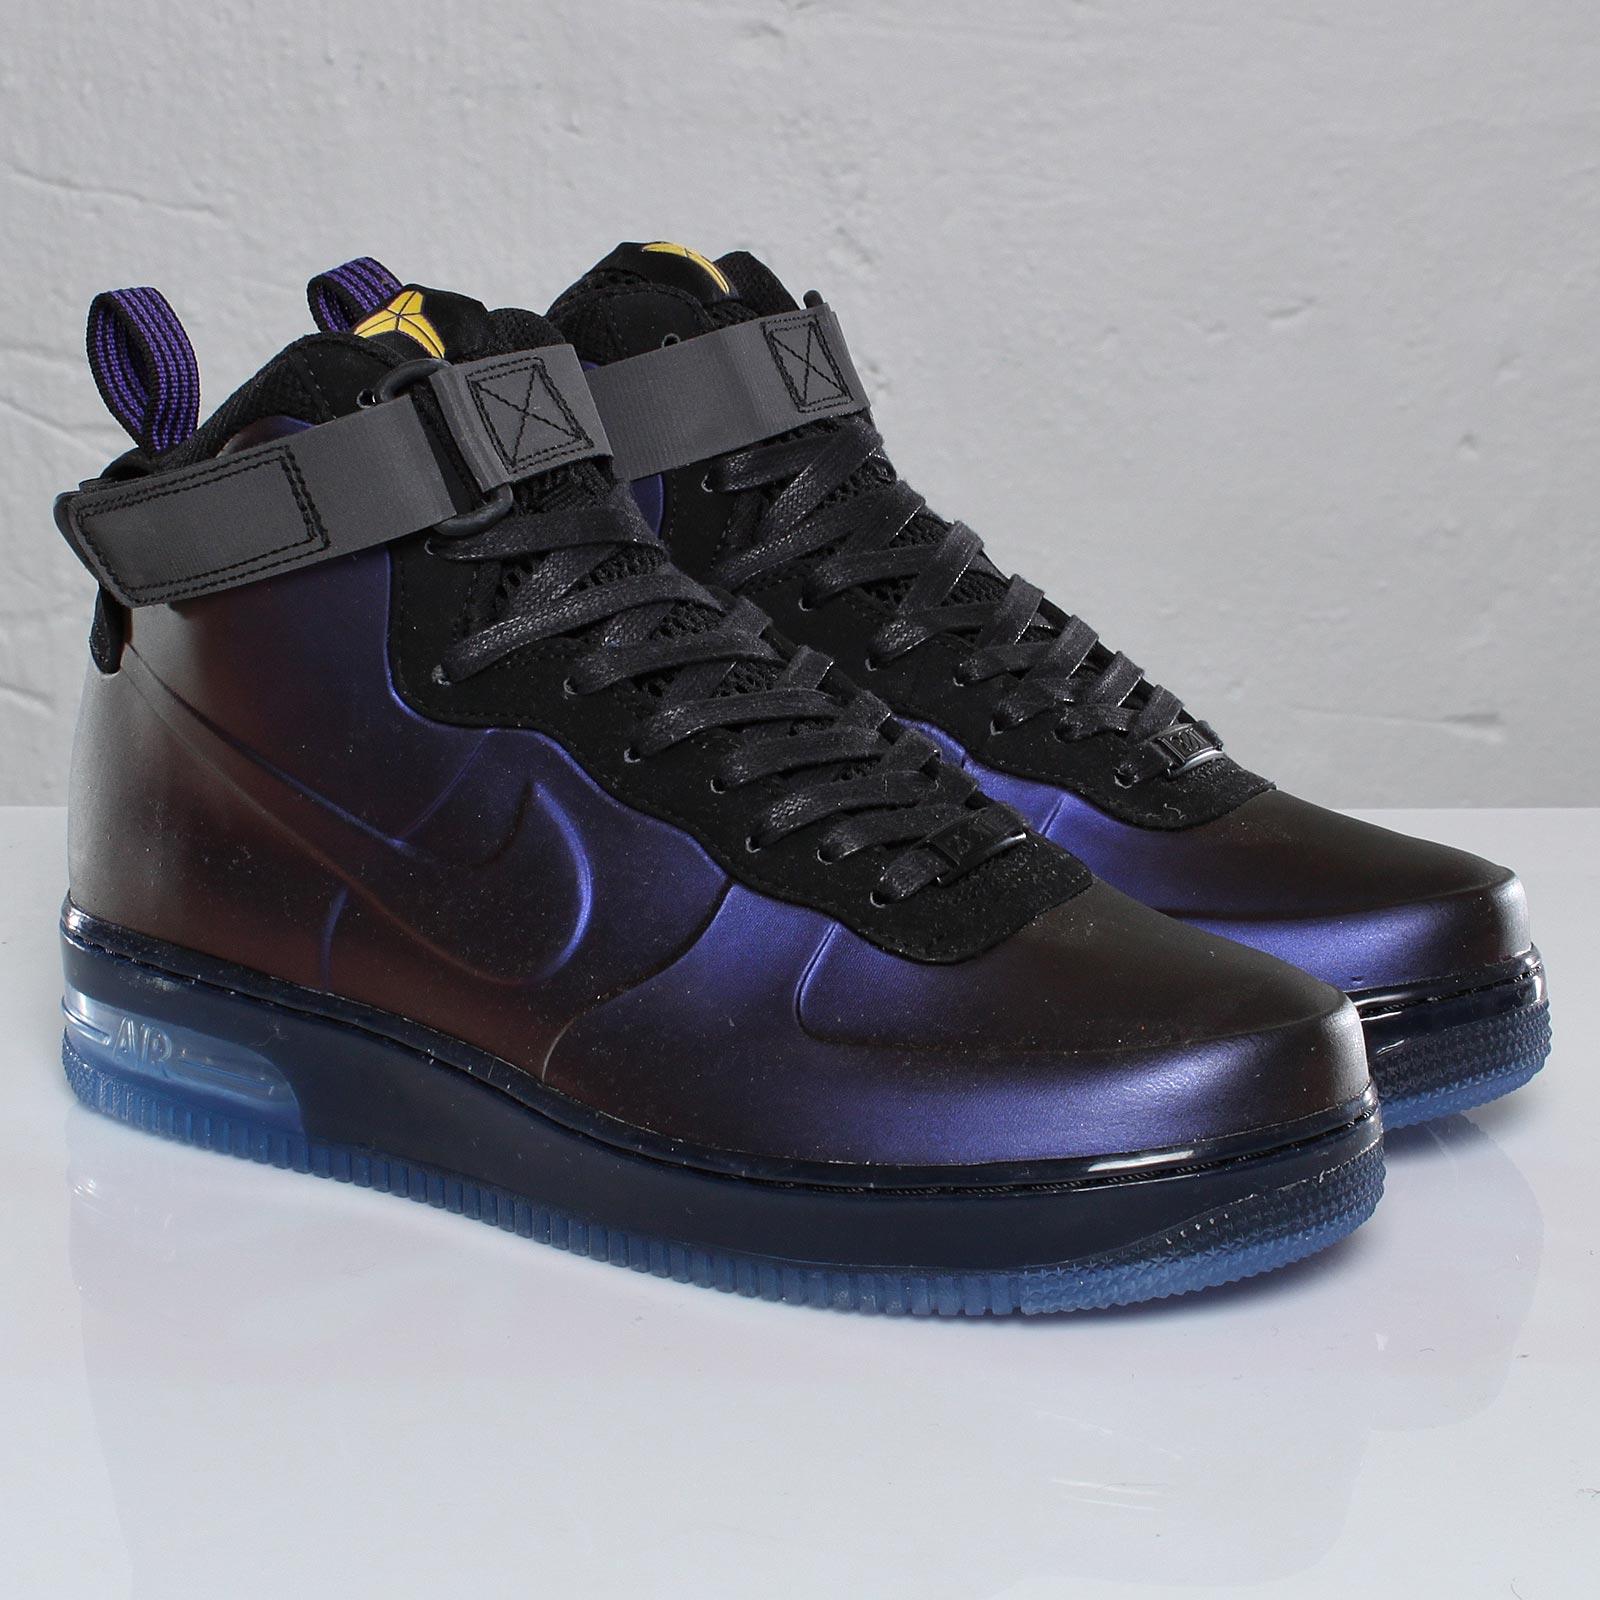 Work Vans For Sale >> Nike Air Force 1 Foamposite - 100560 - Sneakersnstuff | sneakers & streetwear online since 1999